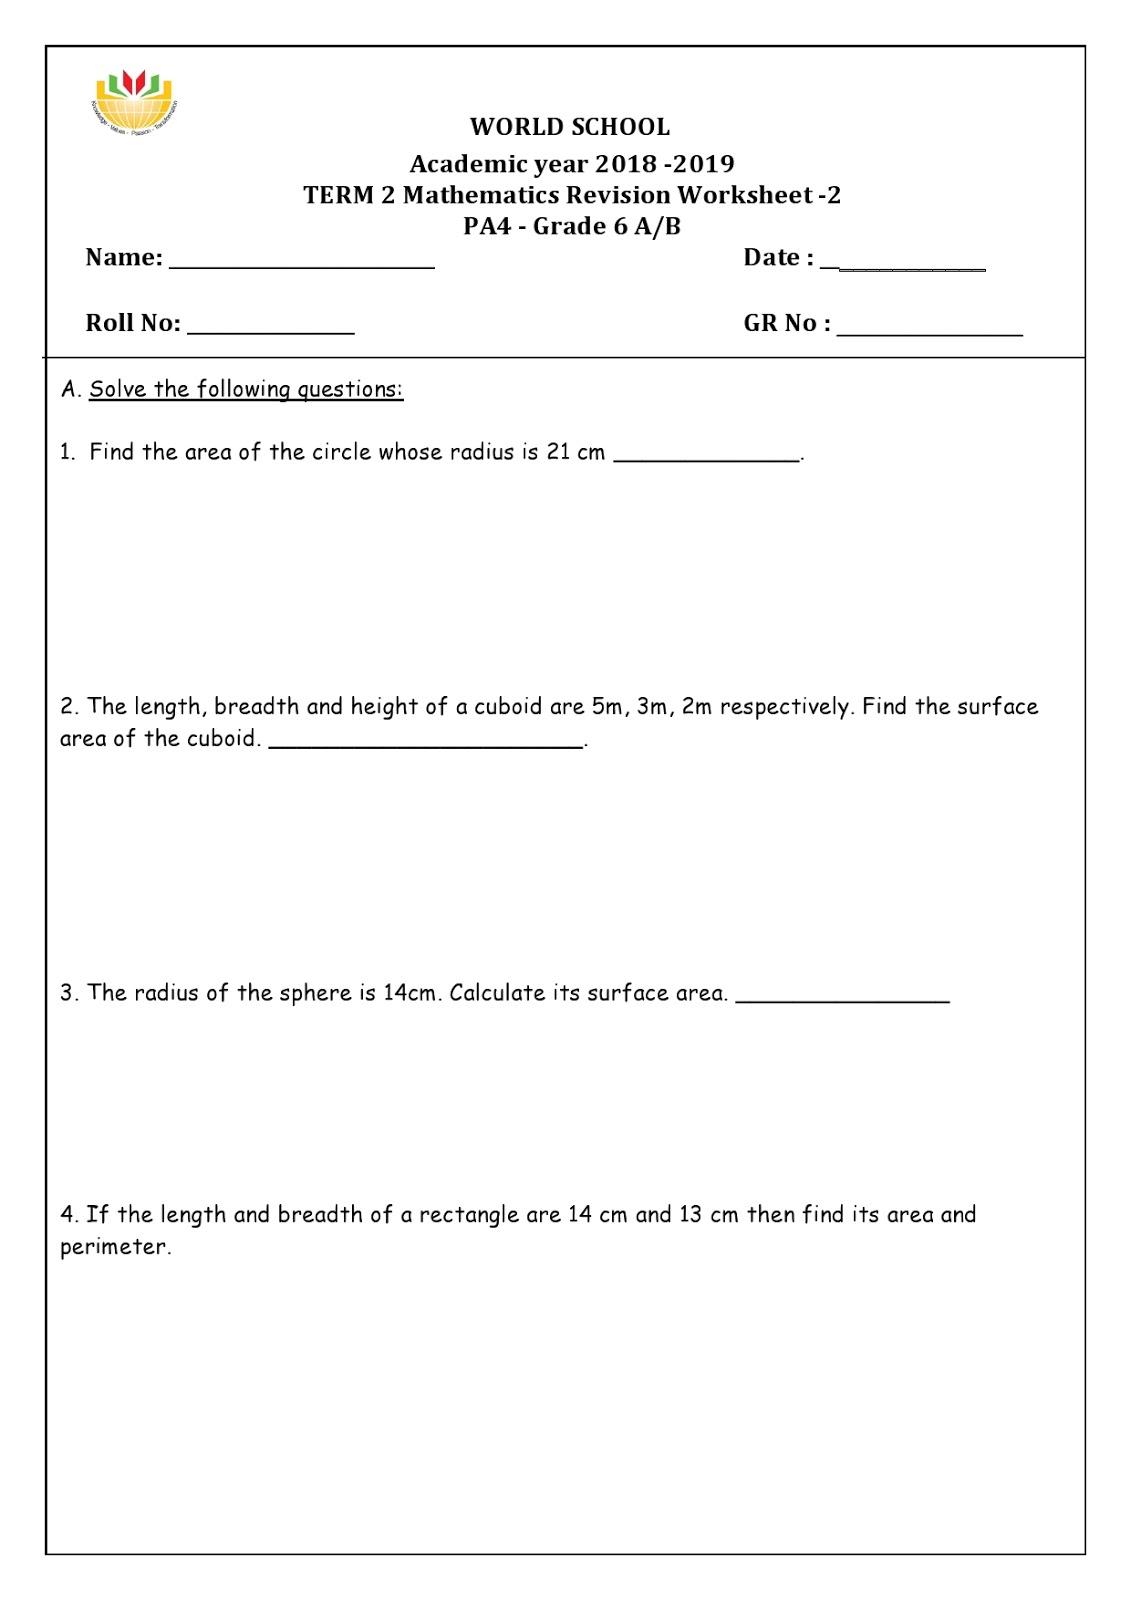 small resolution of WORLD SCHOOL OMAN: Homework for Grade 6 as on 18-04-2019